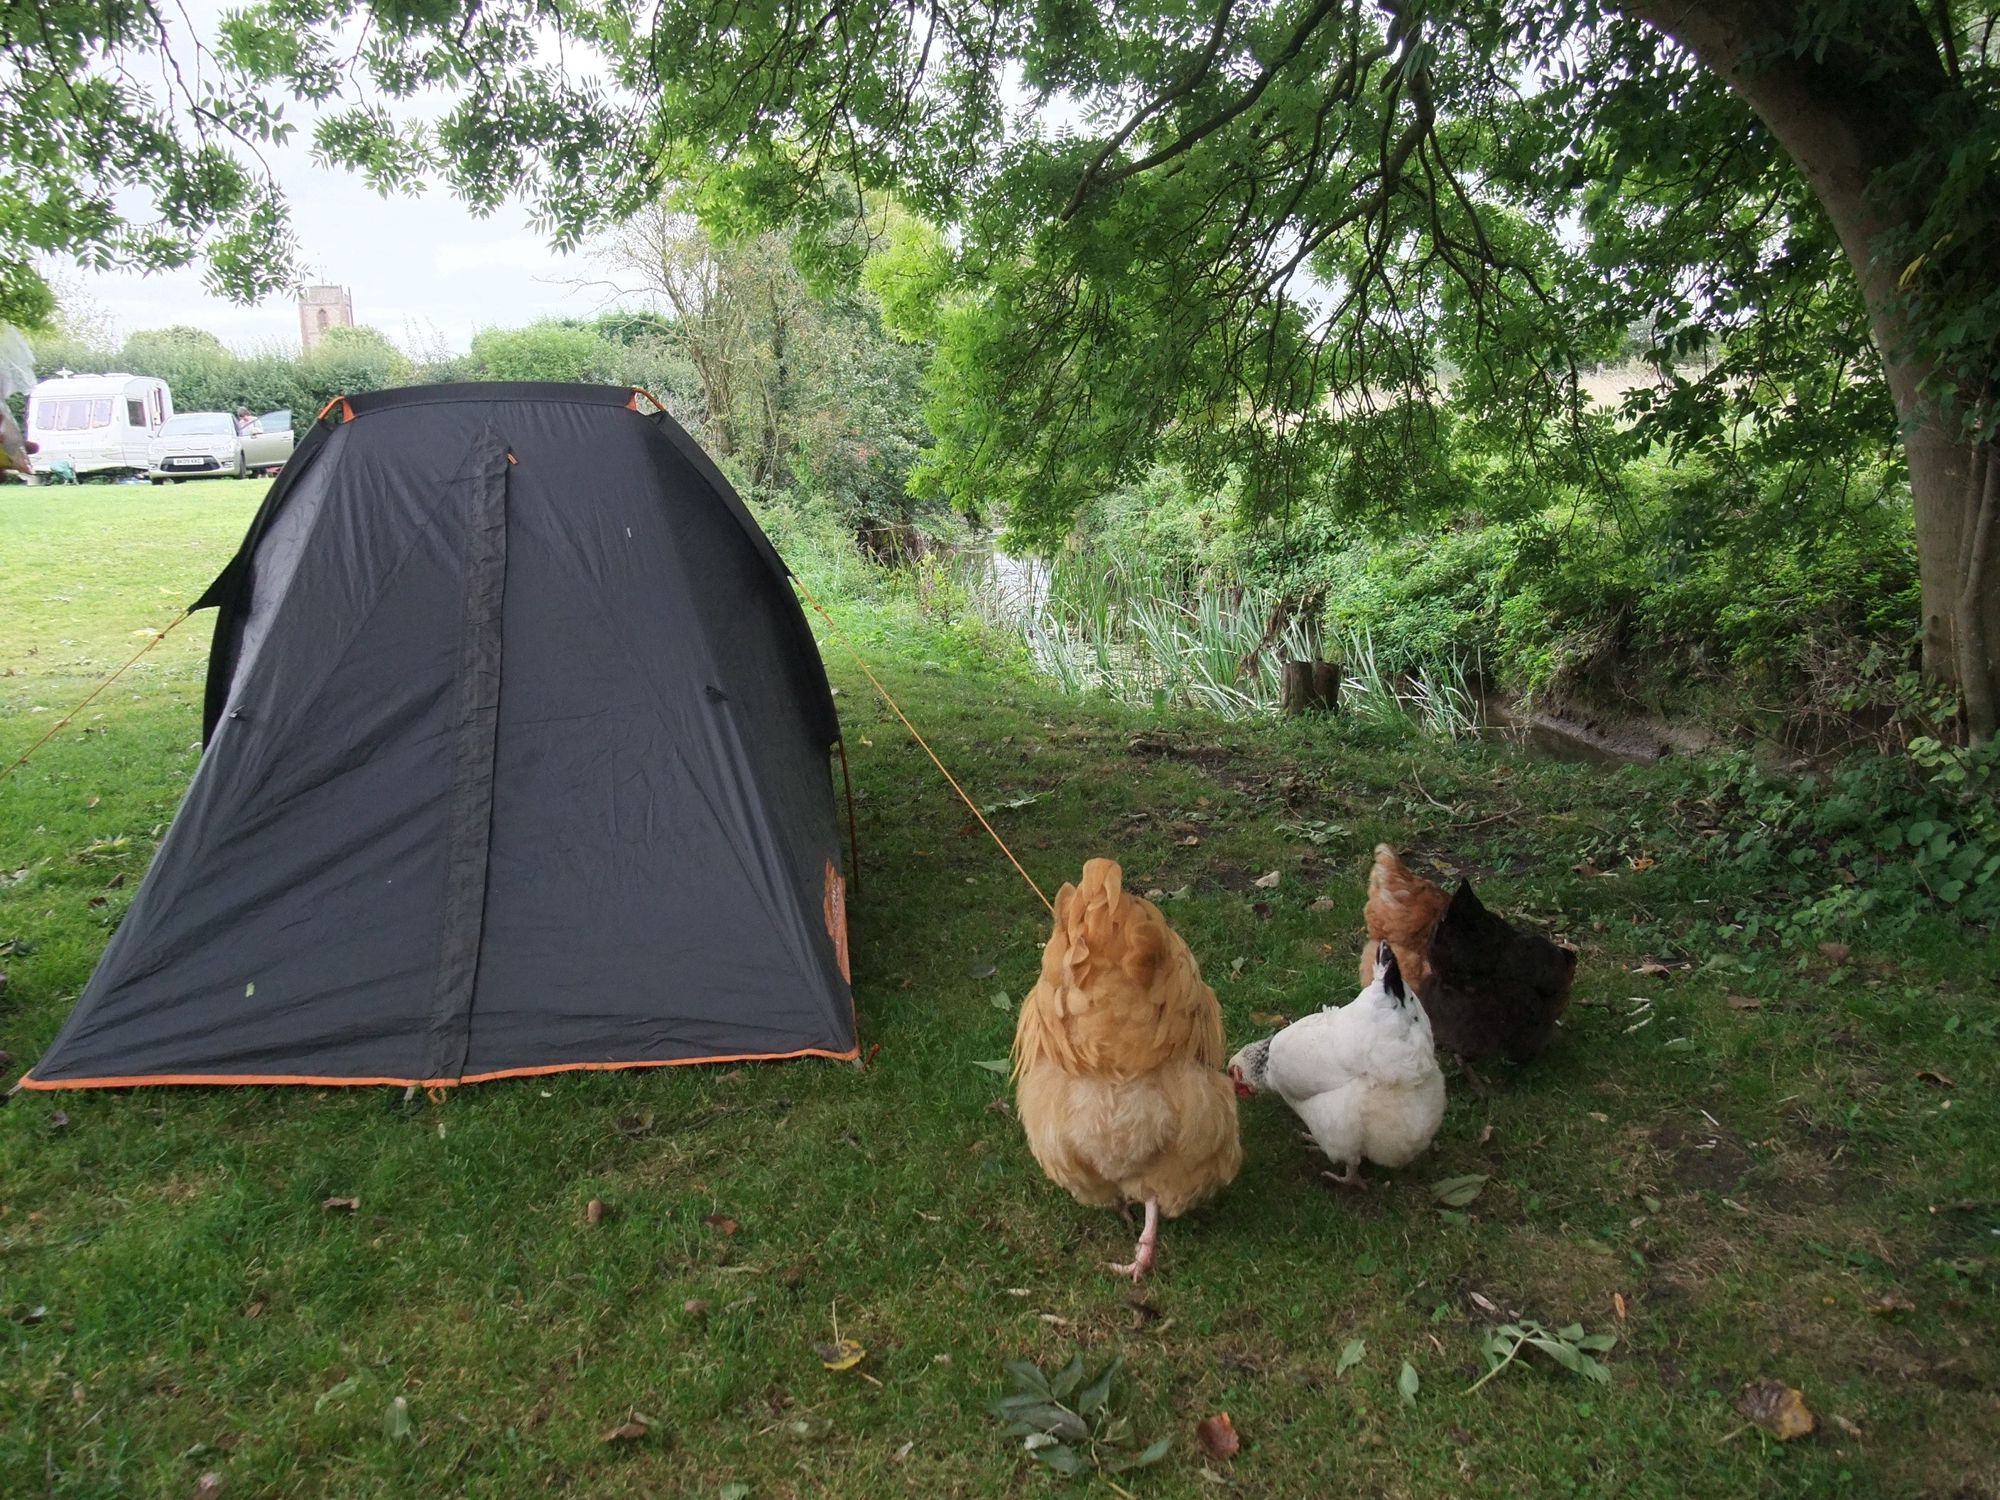 Campsites in Warwickshire